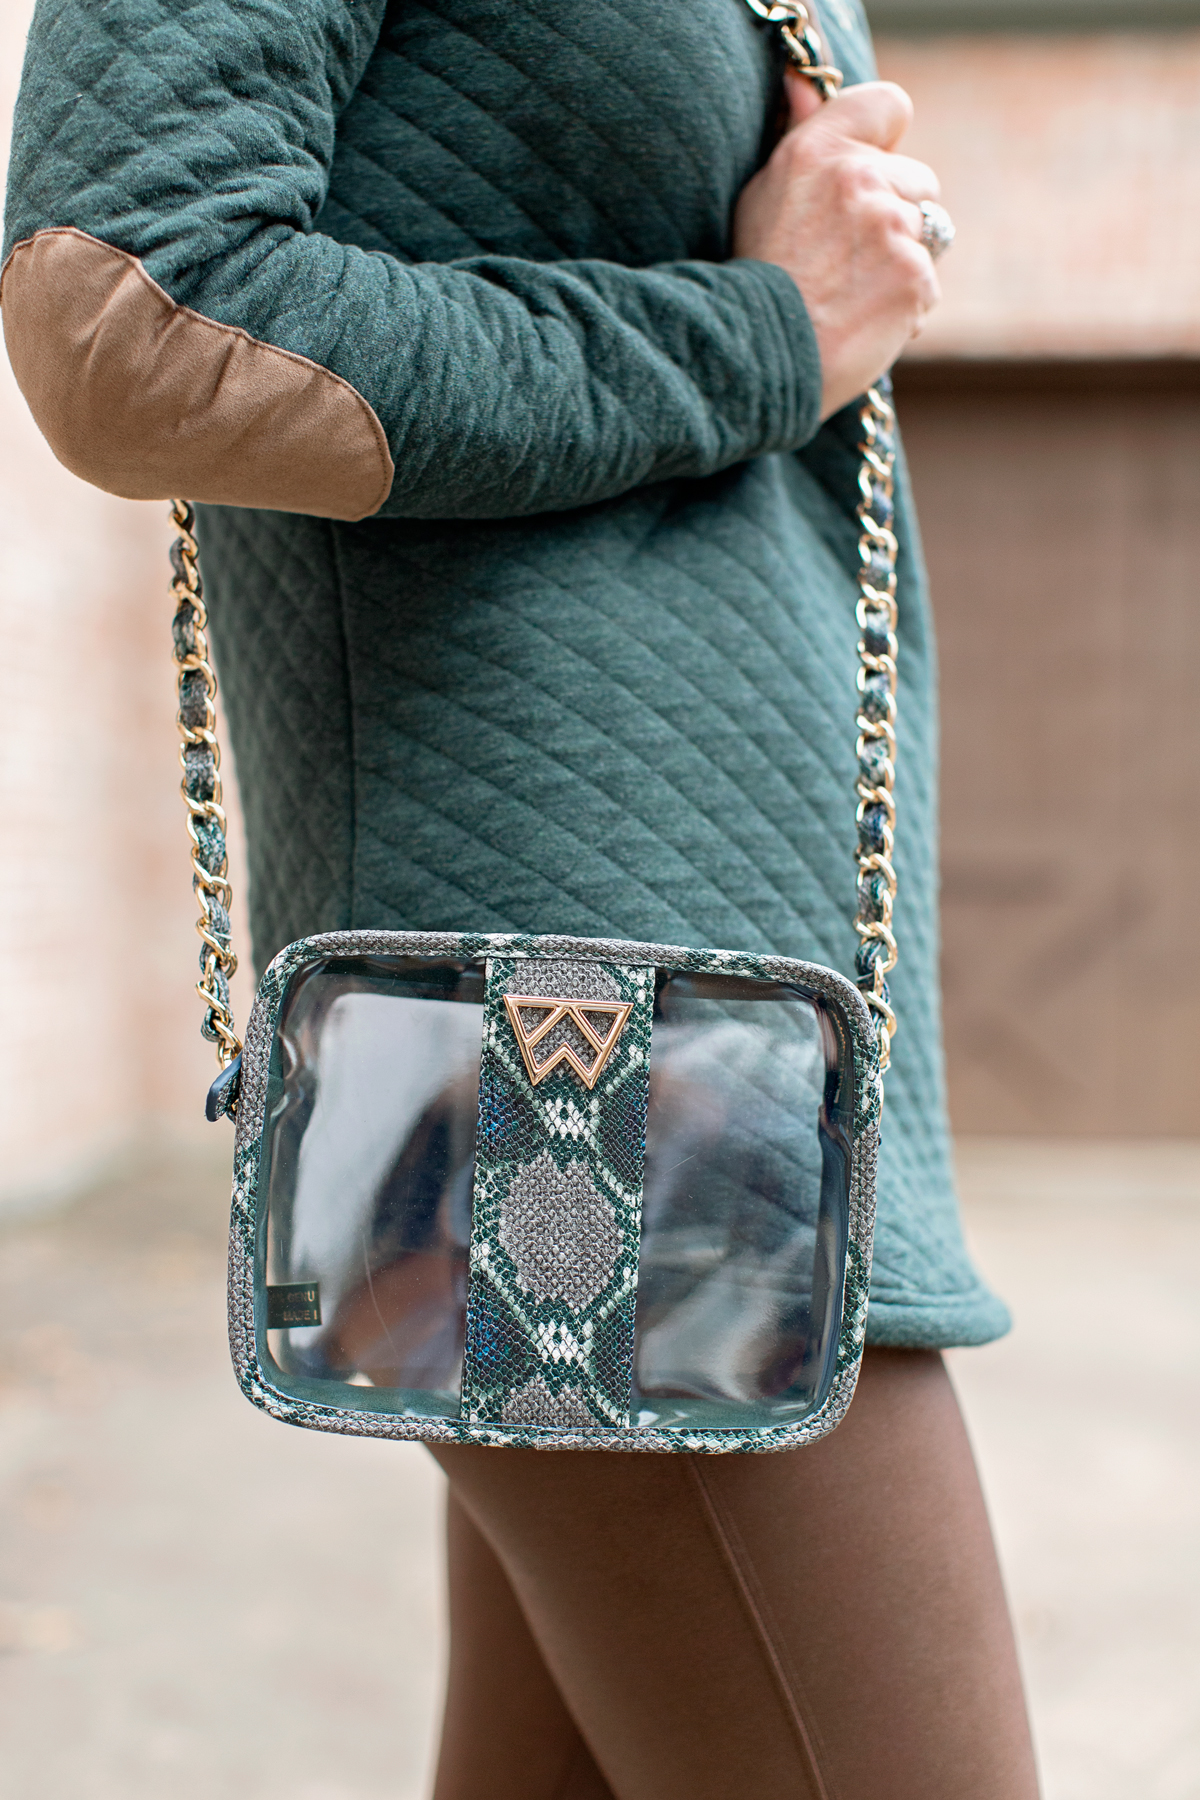 clear handbag with green python trim